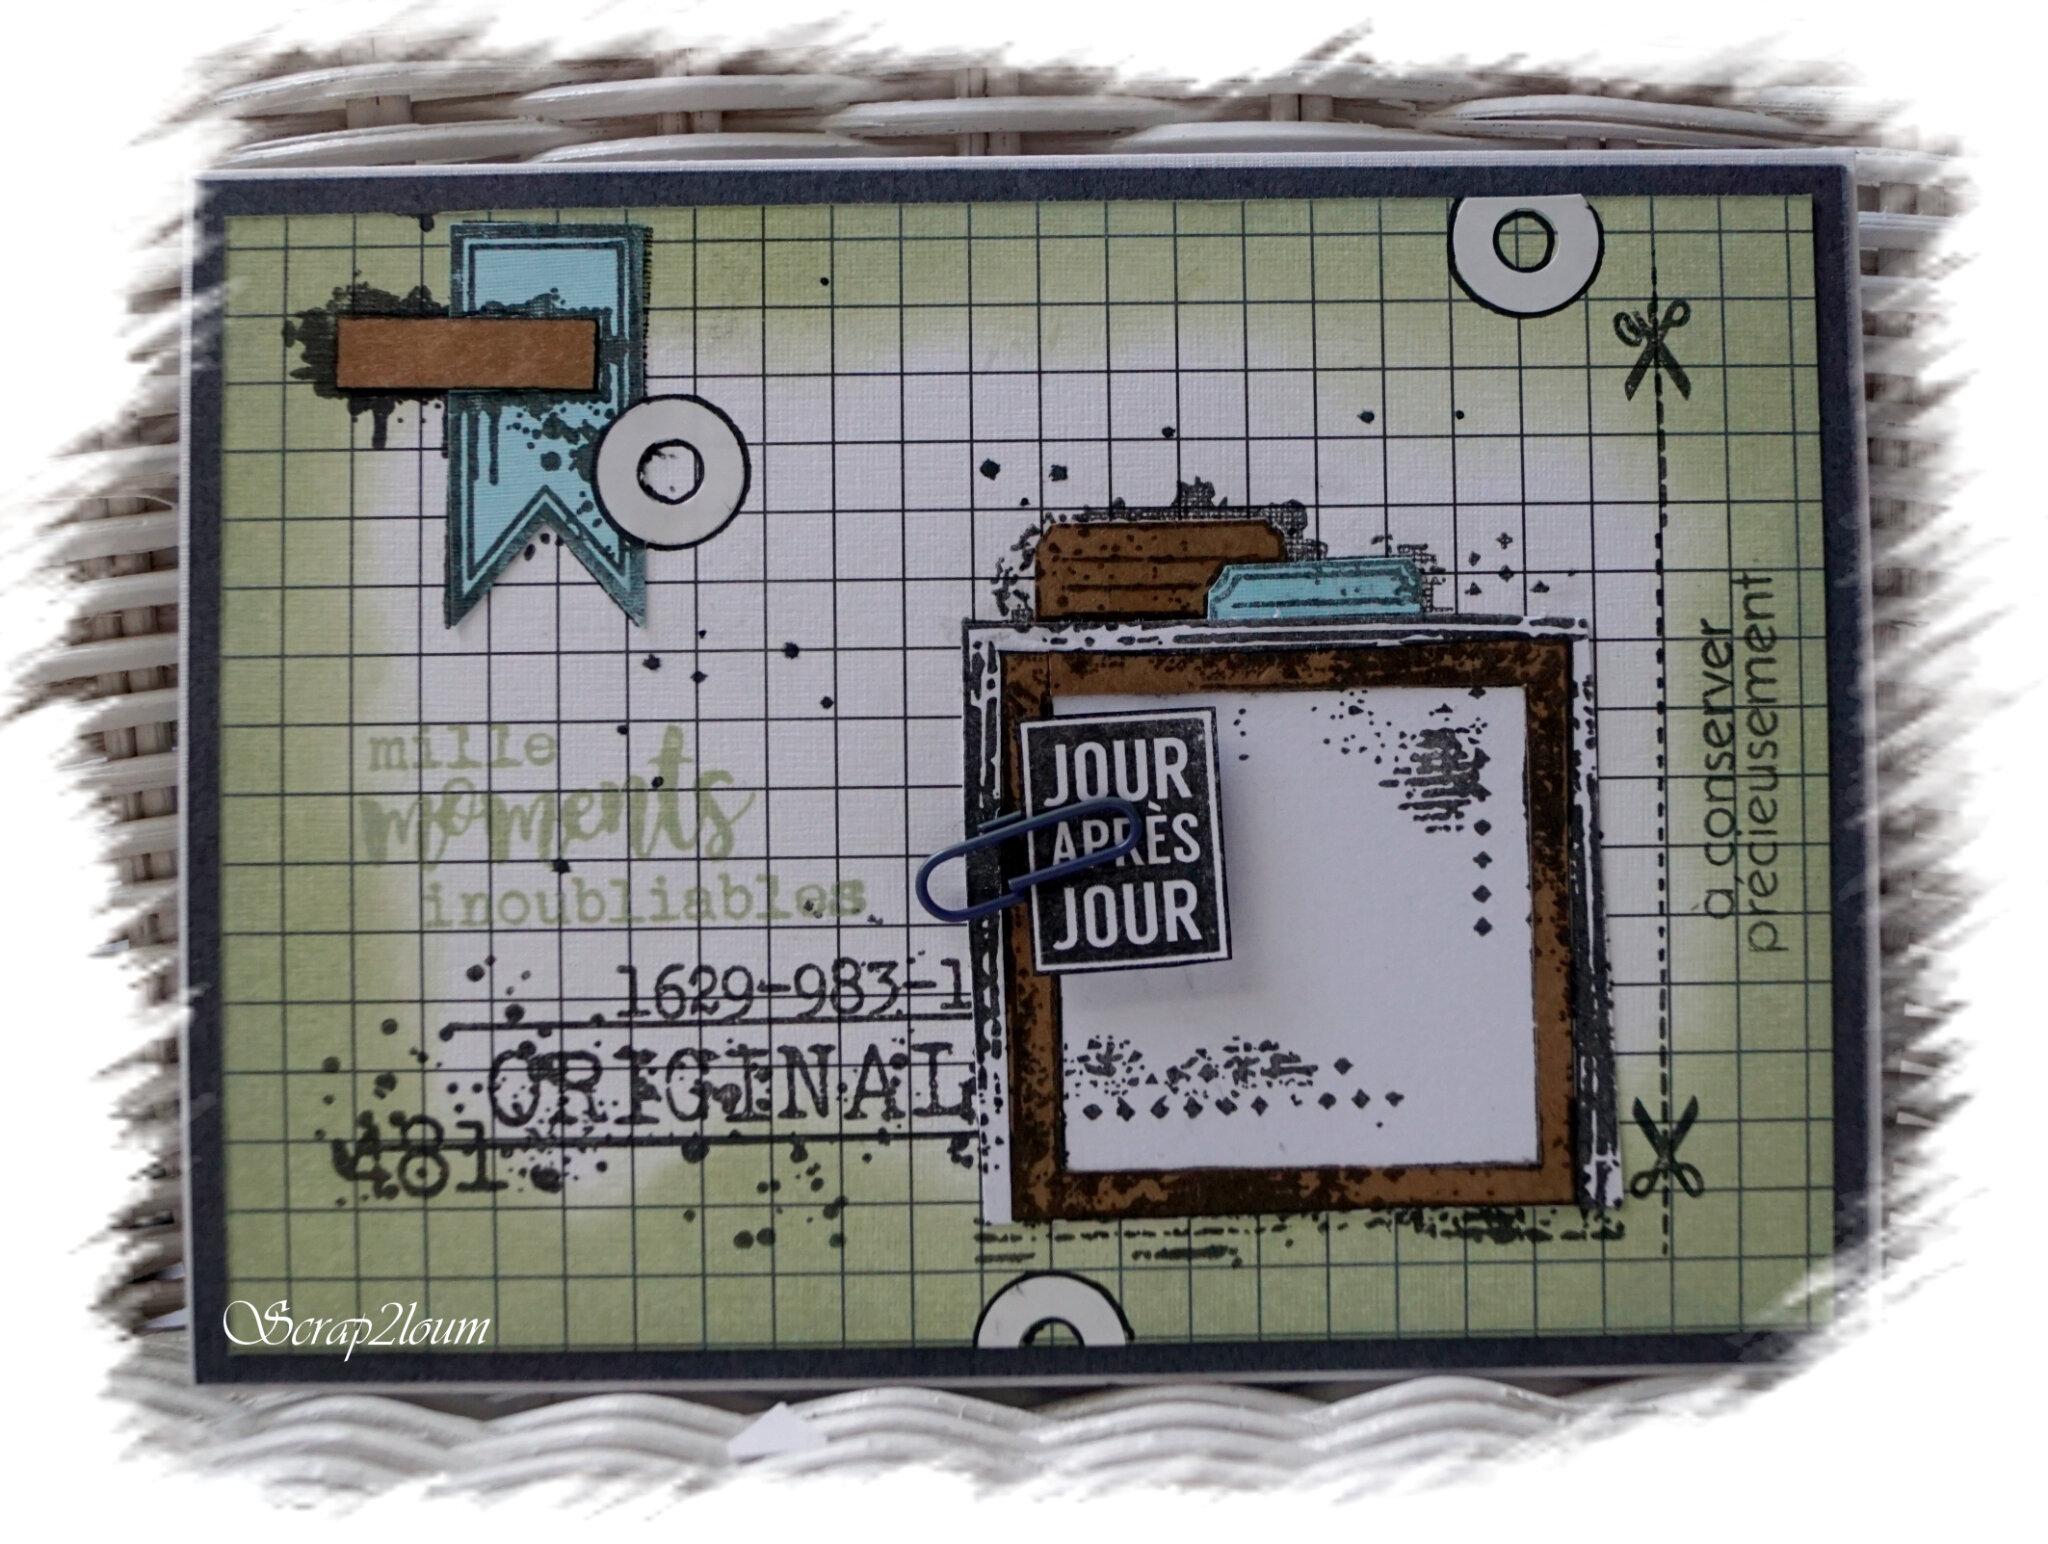 défi carte sept 19